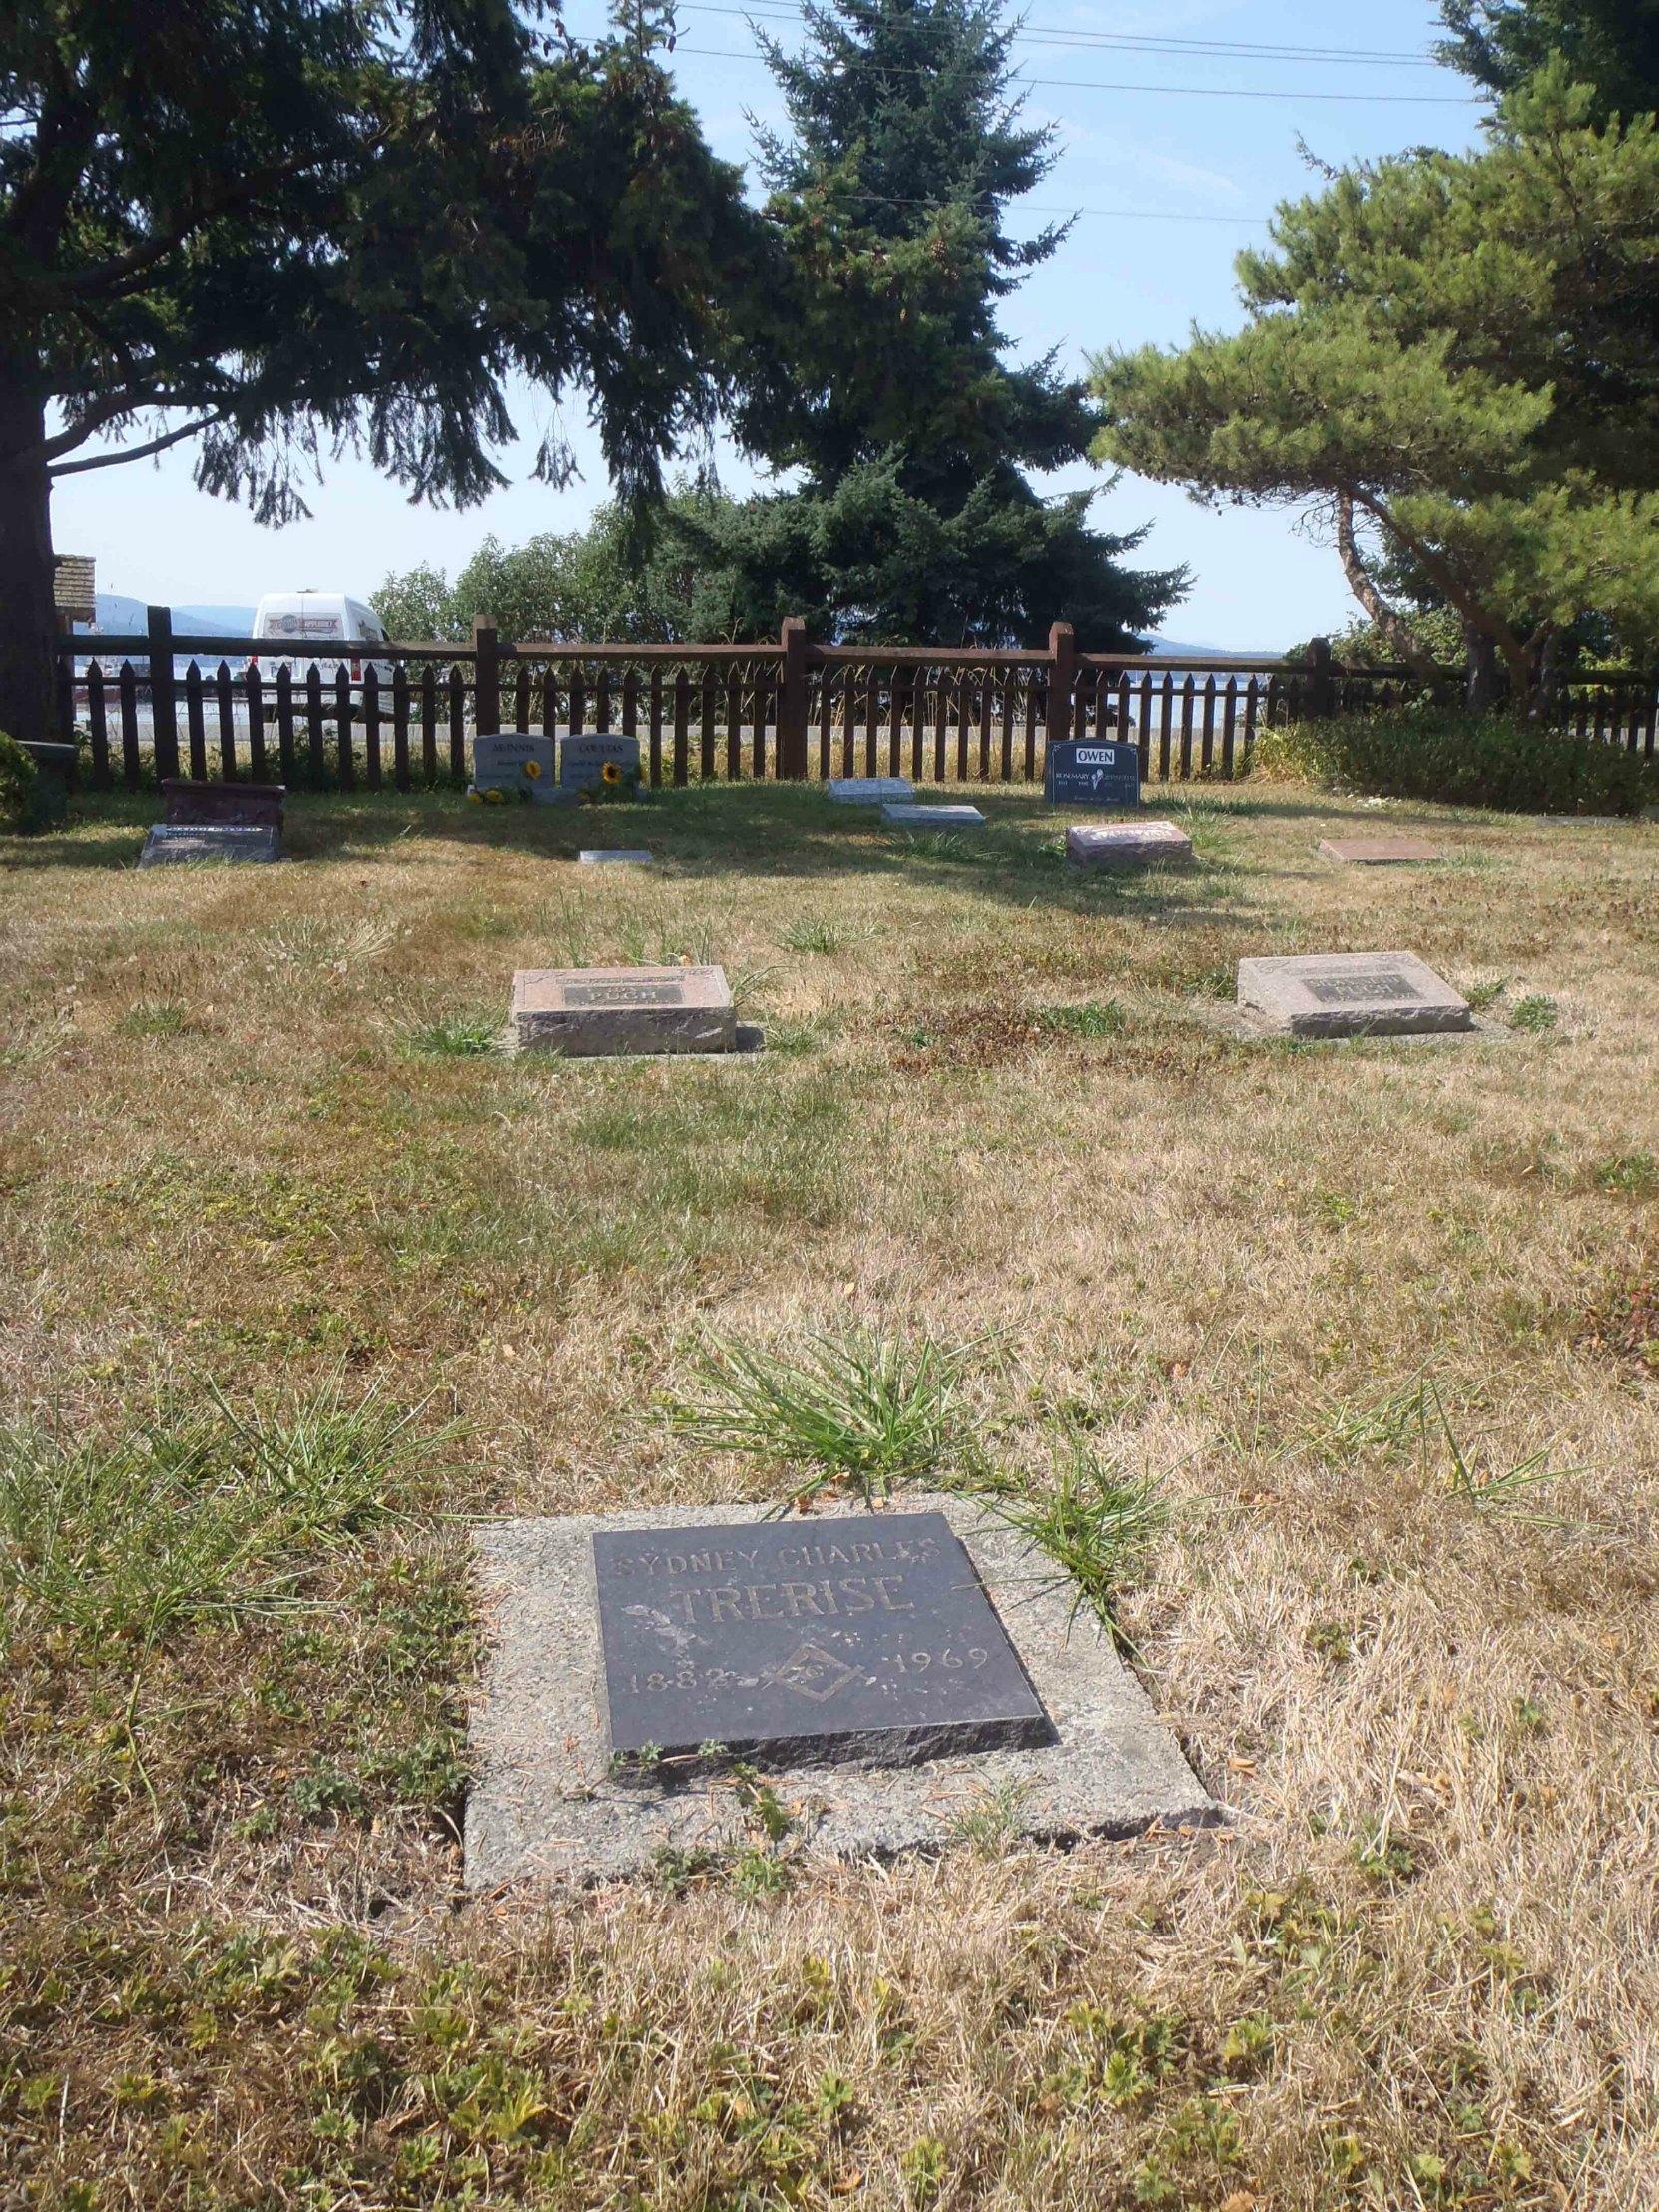 Sydney Charles Trerise grave, Holy Trinity Anglican cemetery, North Saanich, B.C.